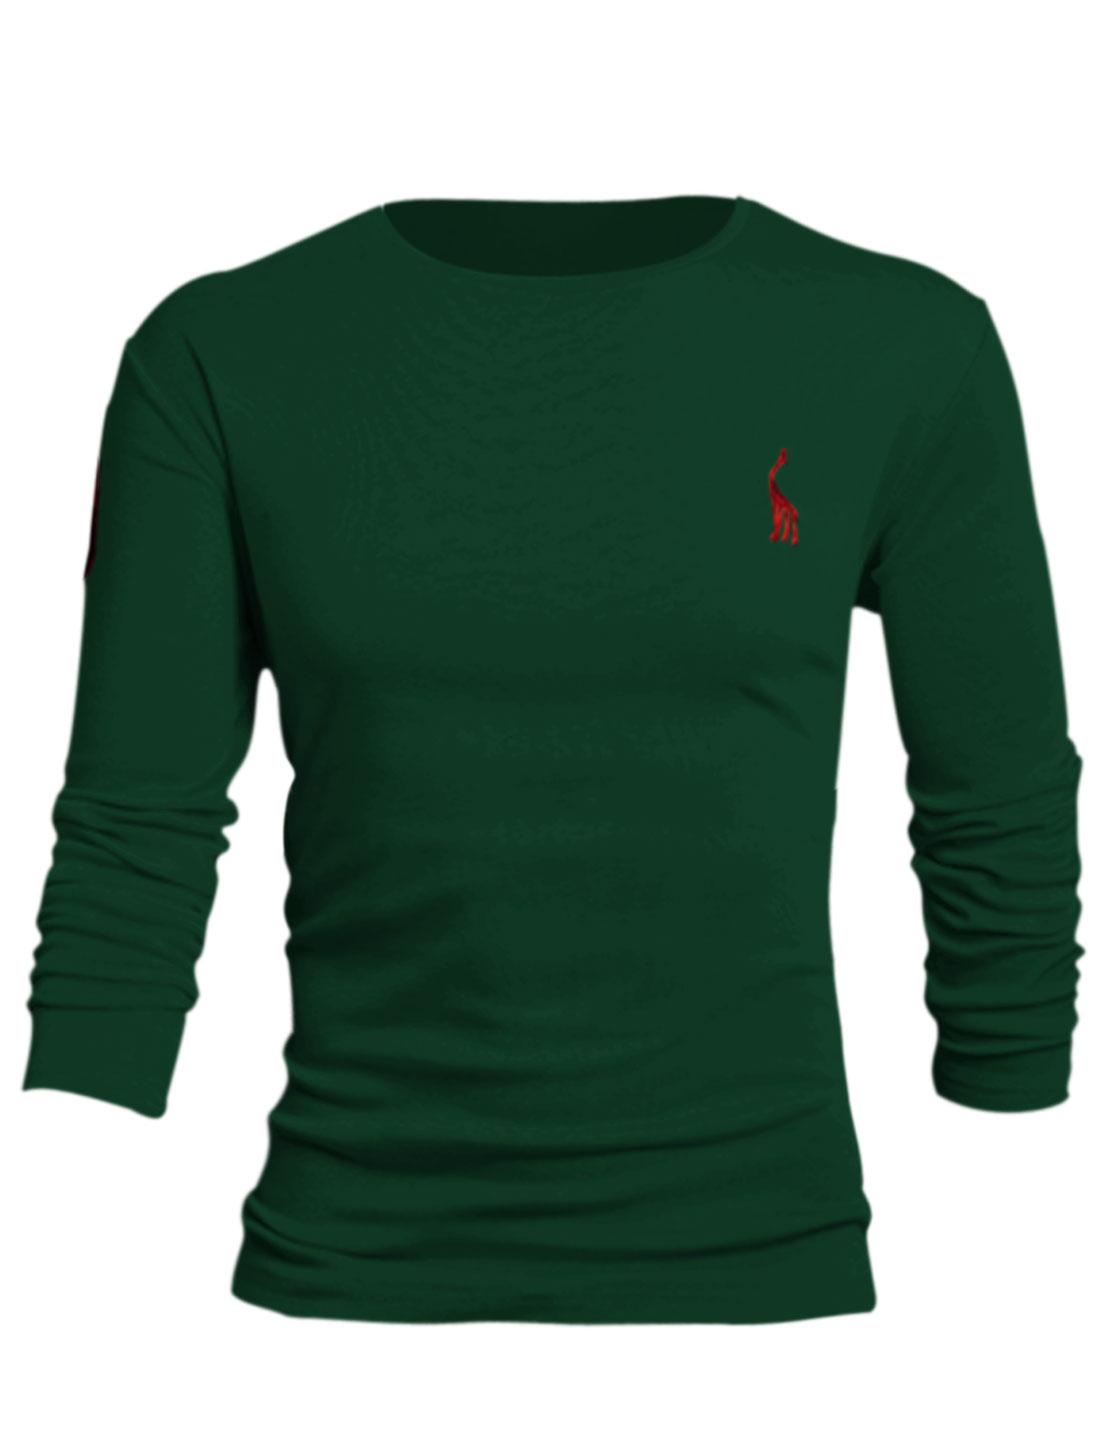 Men Number Applique Slipover Design Stylish Style Tee Shirt Dark Green L